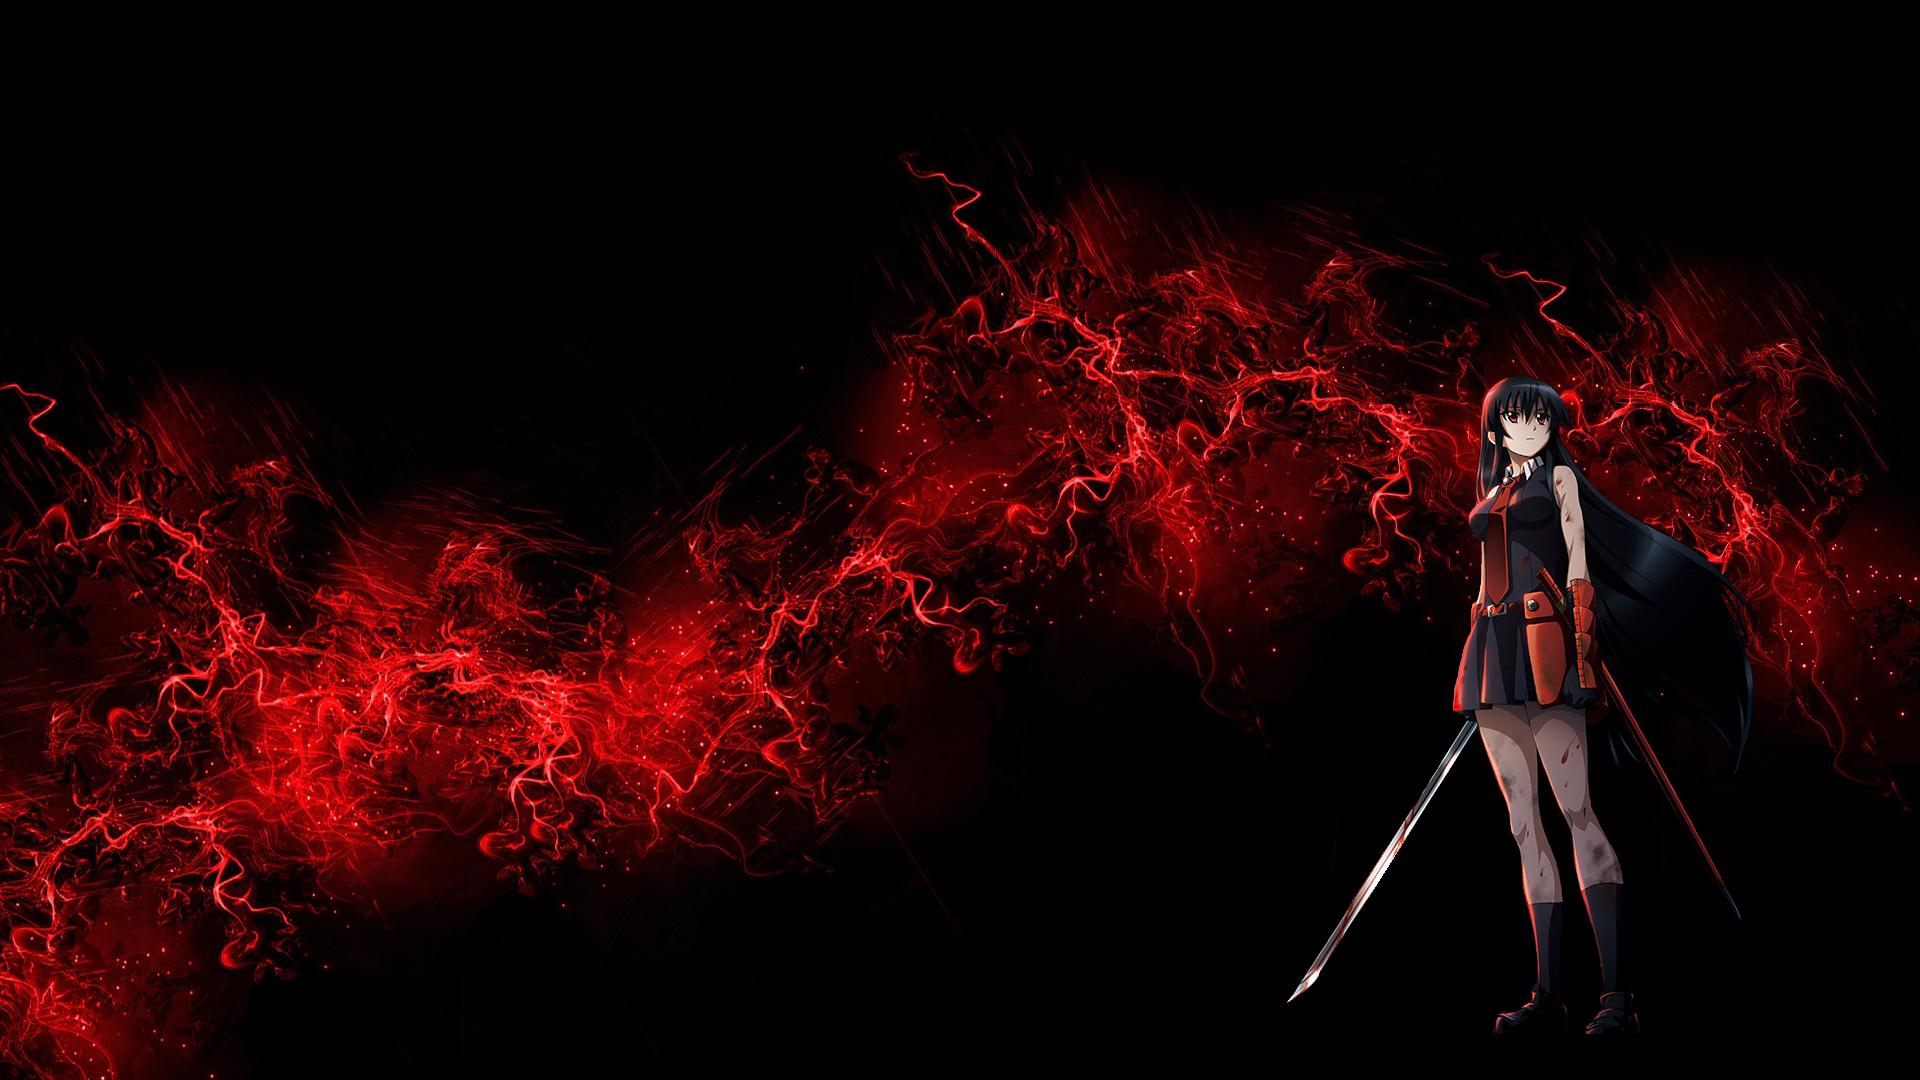 Anime Akame Ga Kill Akame Akame Ga Kill Wallpaper Dark Red Wallpaper Red Wallpaper Black Background Wallpaper